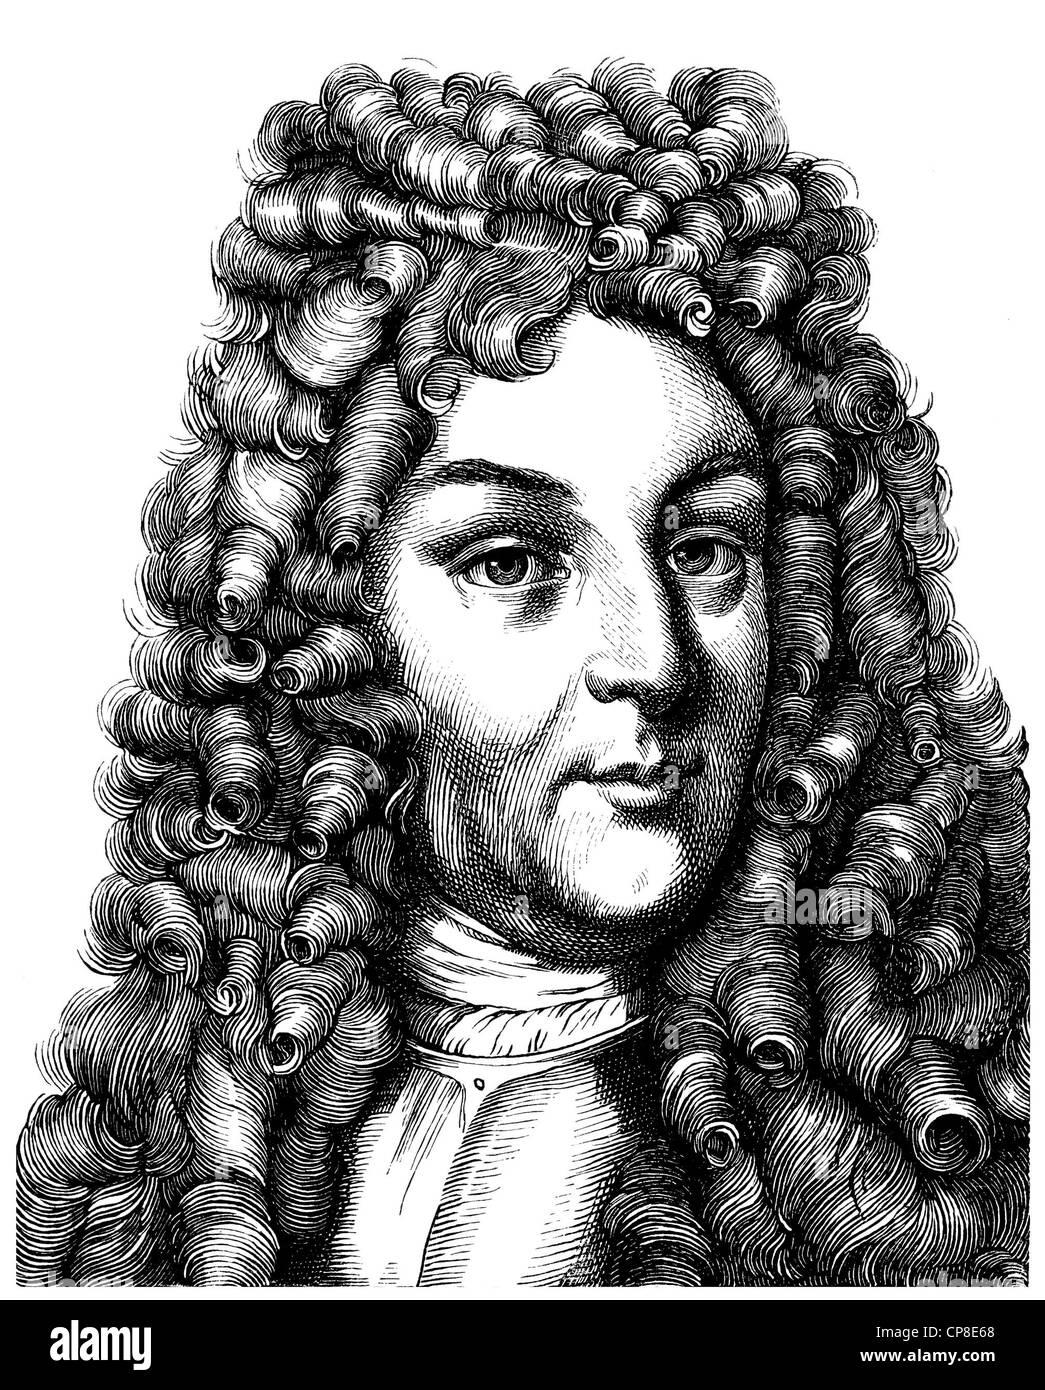 Margrave Ludwig Wilhelm von Baden-Baden or Tuerkenlouis, 1655 - 1707, regent of the marquisate of Baden-Baden, lieutenant - Stock Image